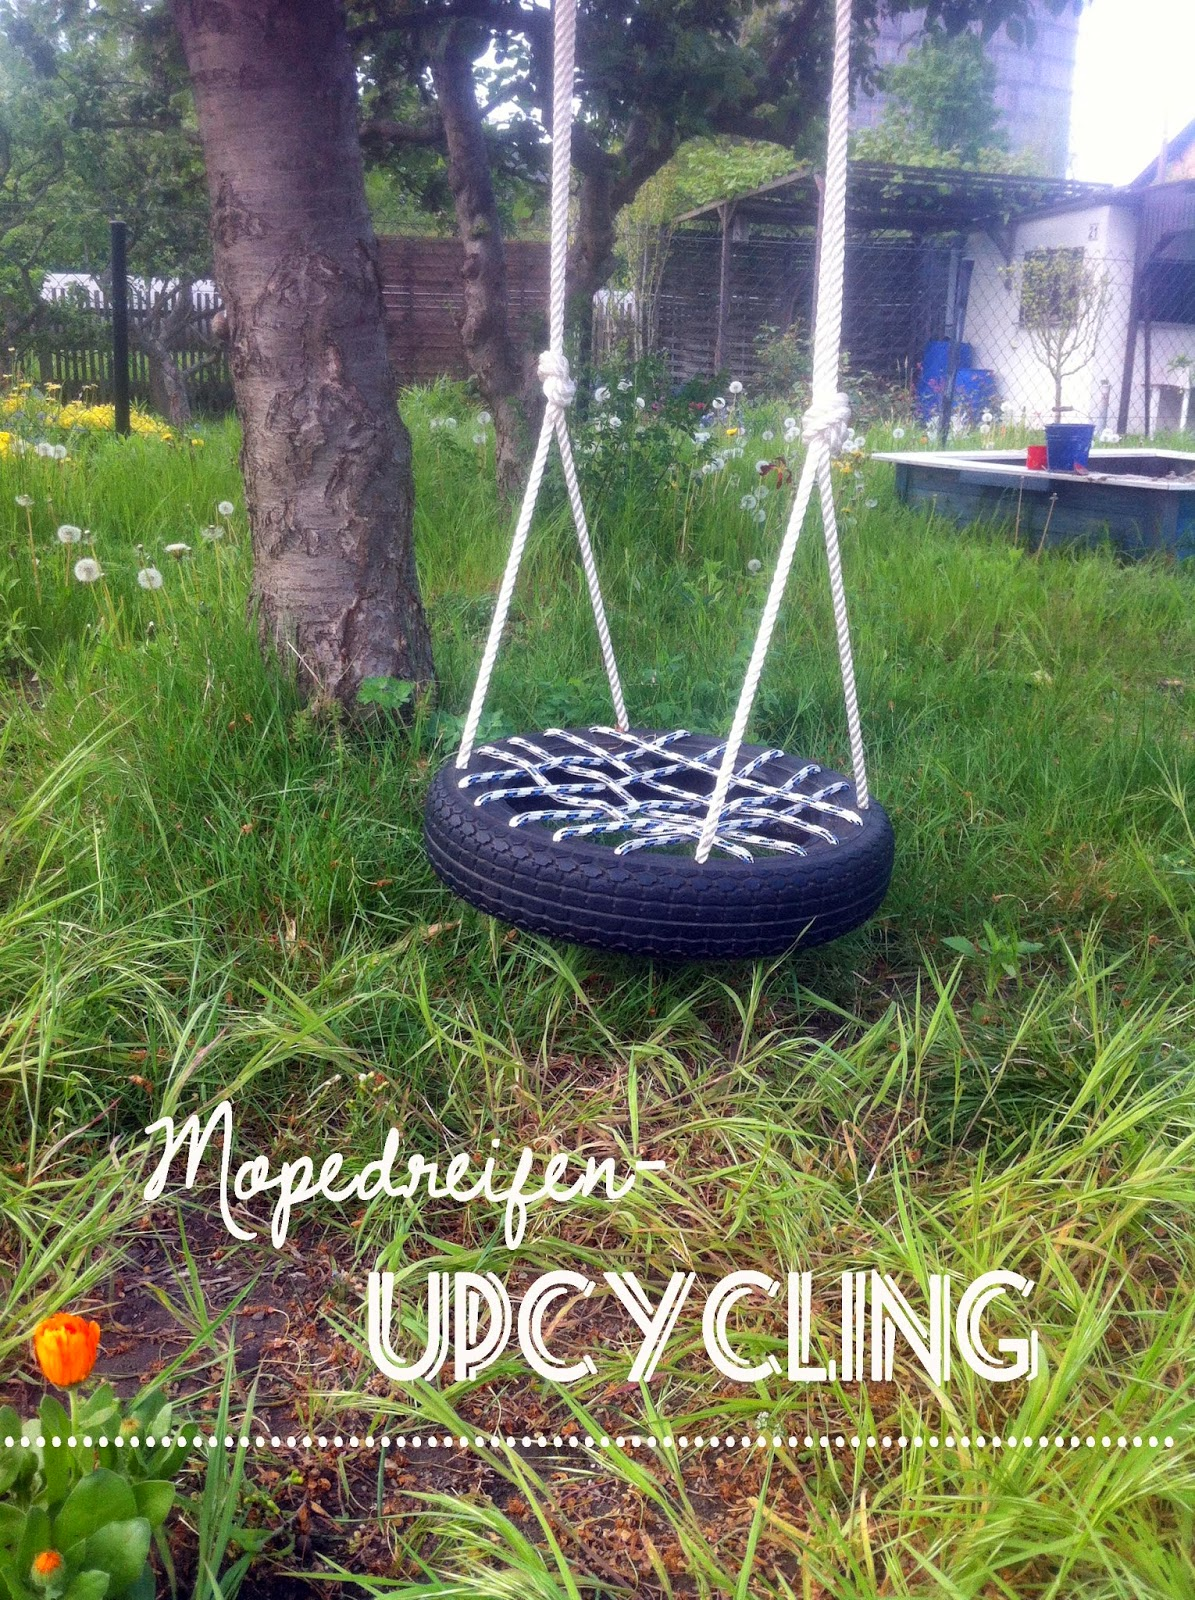 15 Incredible Diy Swings For Kids Bringing A Lot More Joy To Your Yard